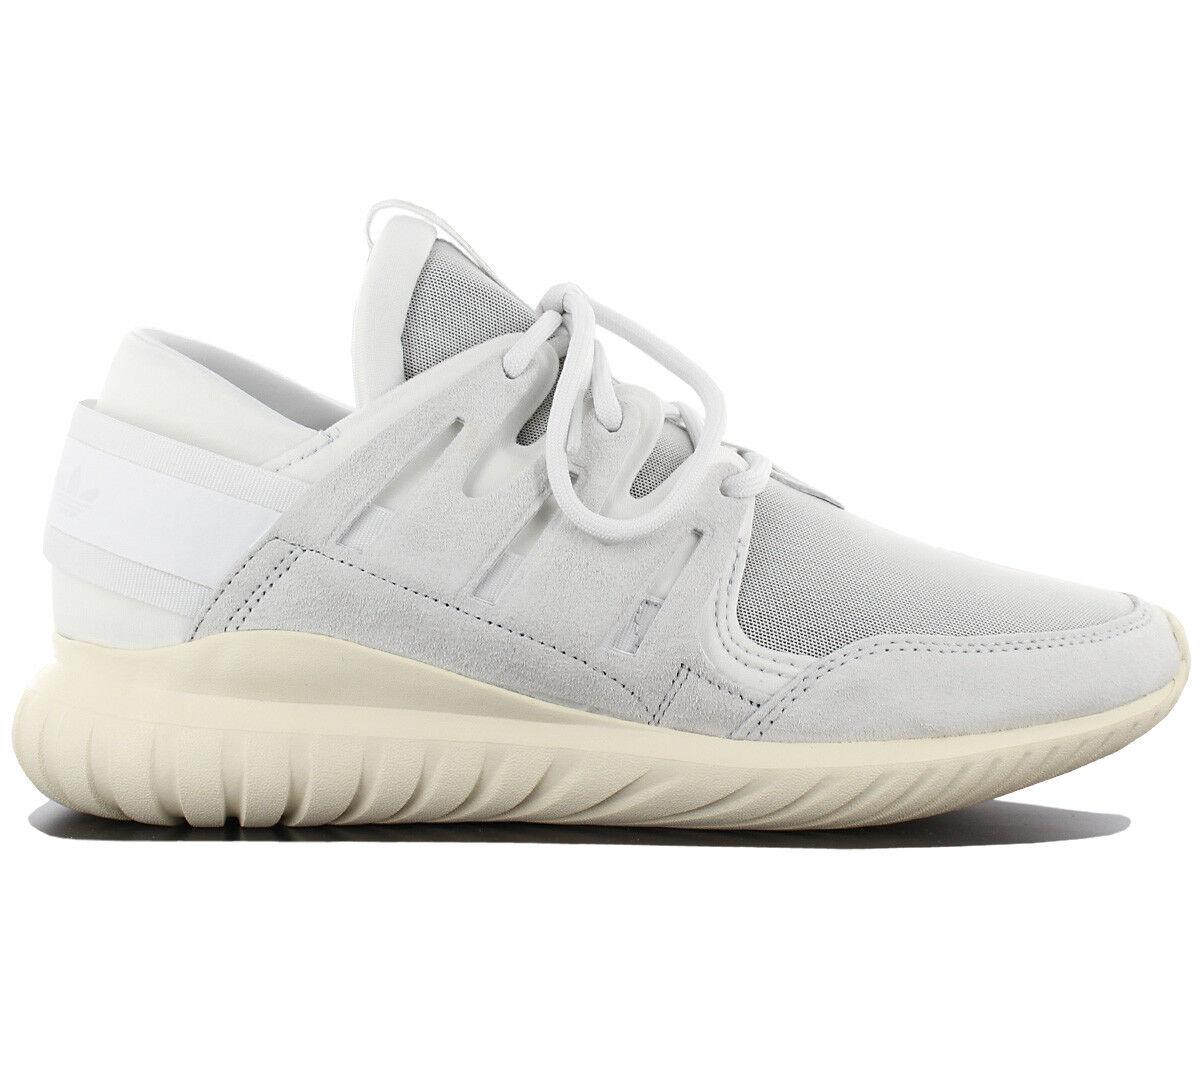 Adidas Originals Tubulaire Nova chaussures Baskets Vintage blanc S74821 Neuf